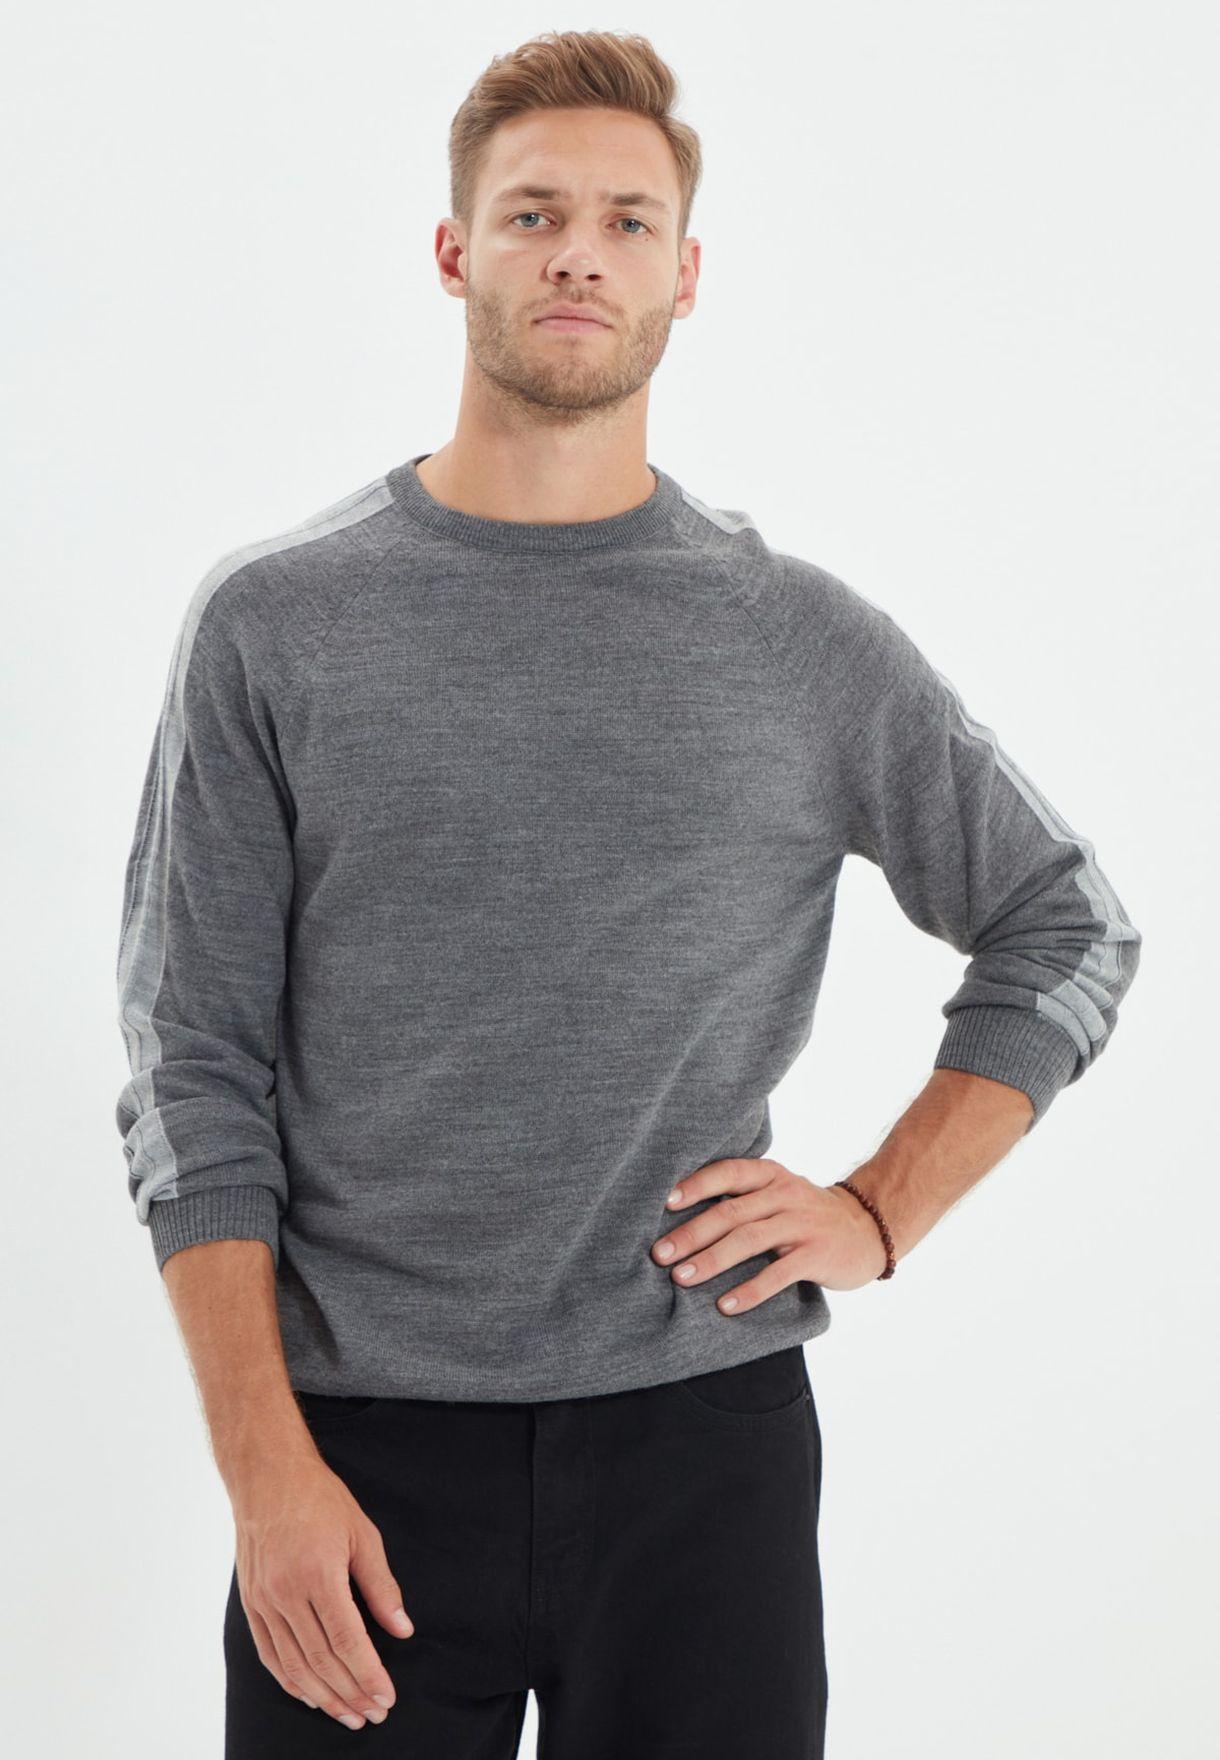 Striped Sleeve Crew Neck Sweater